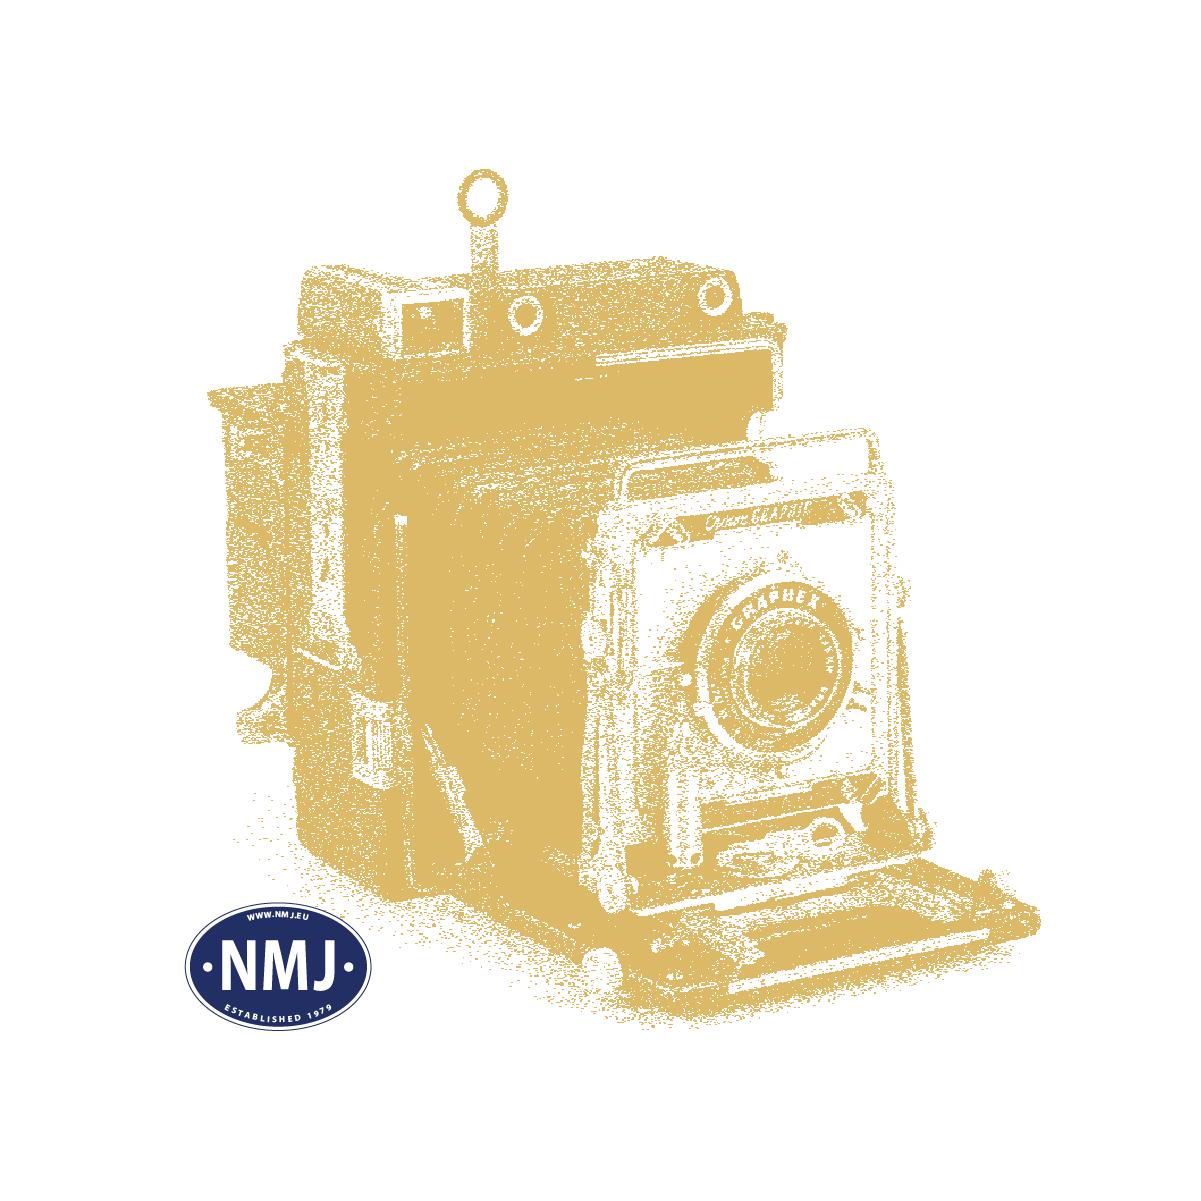 NMJTKAT16 - NMJ Katalogpakke 2016: Topline, Superline, Skyline